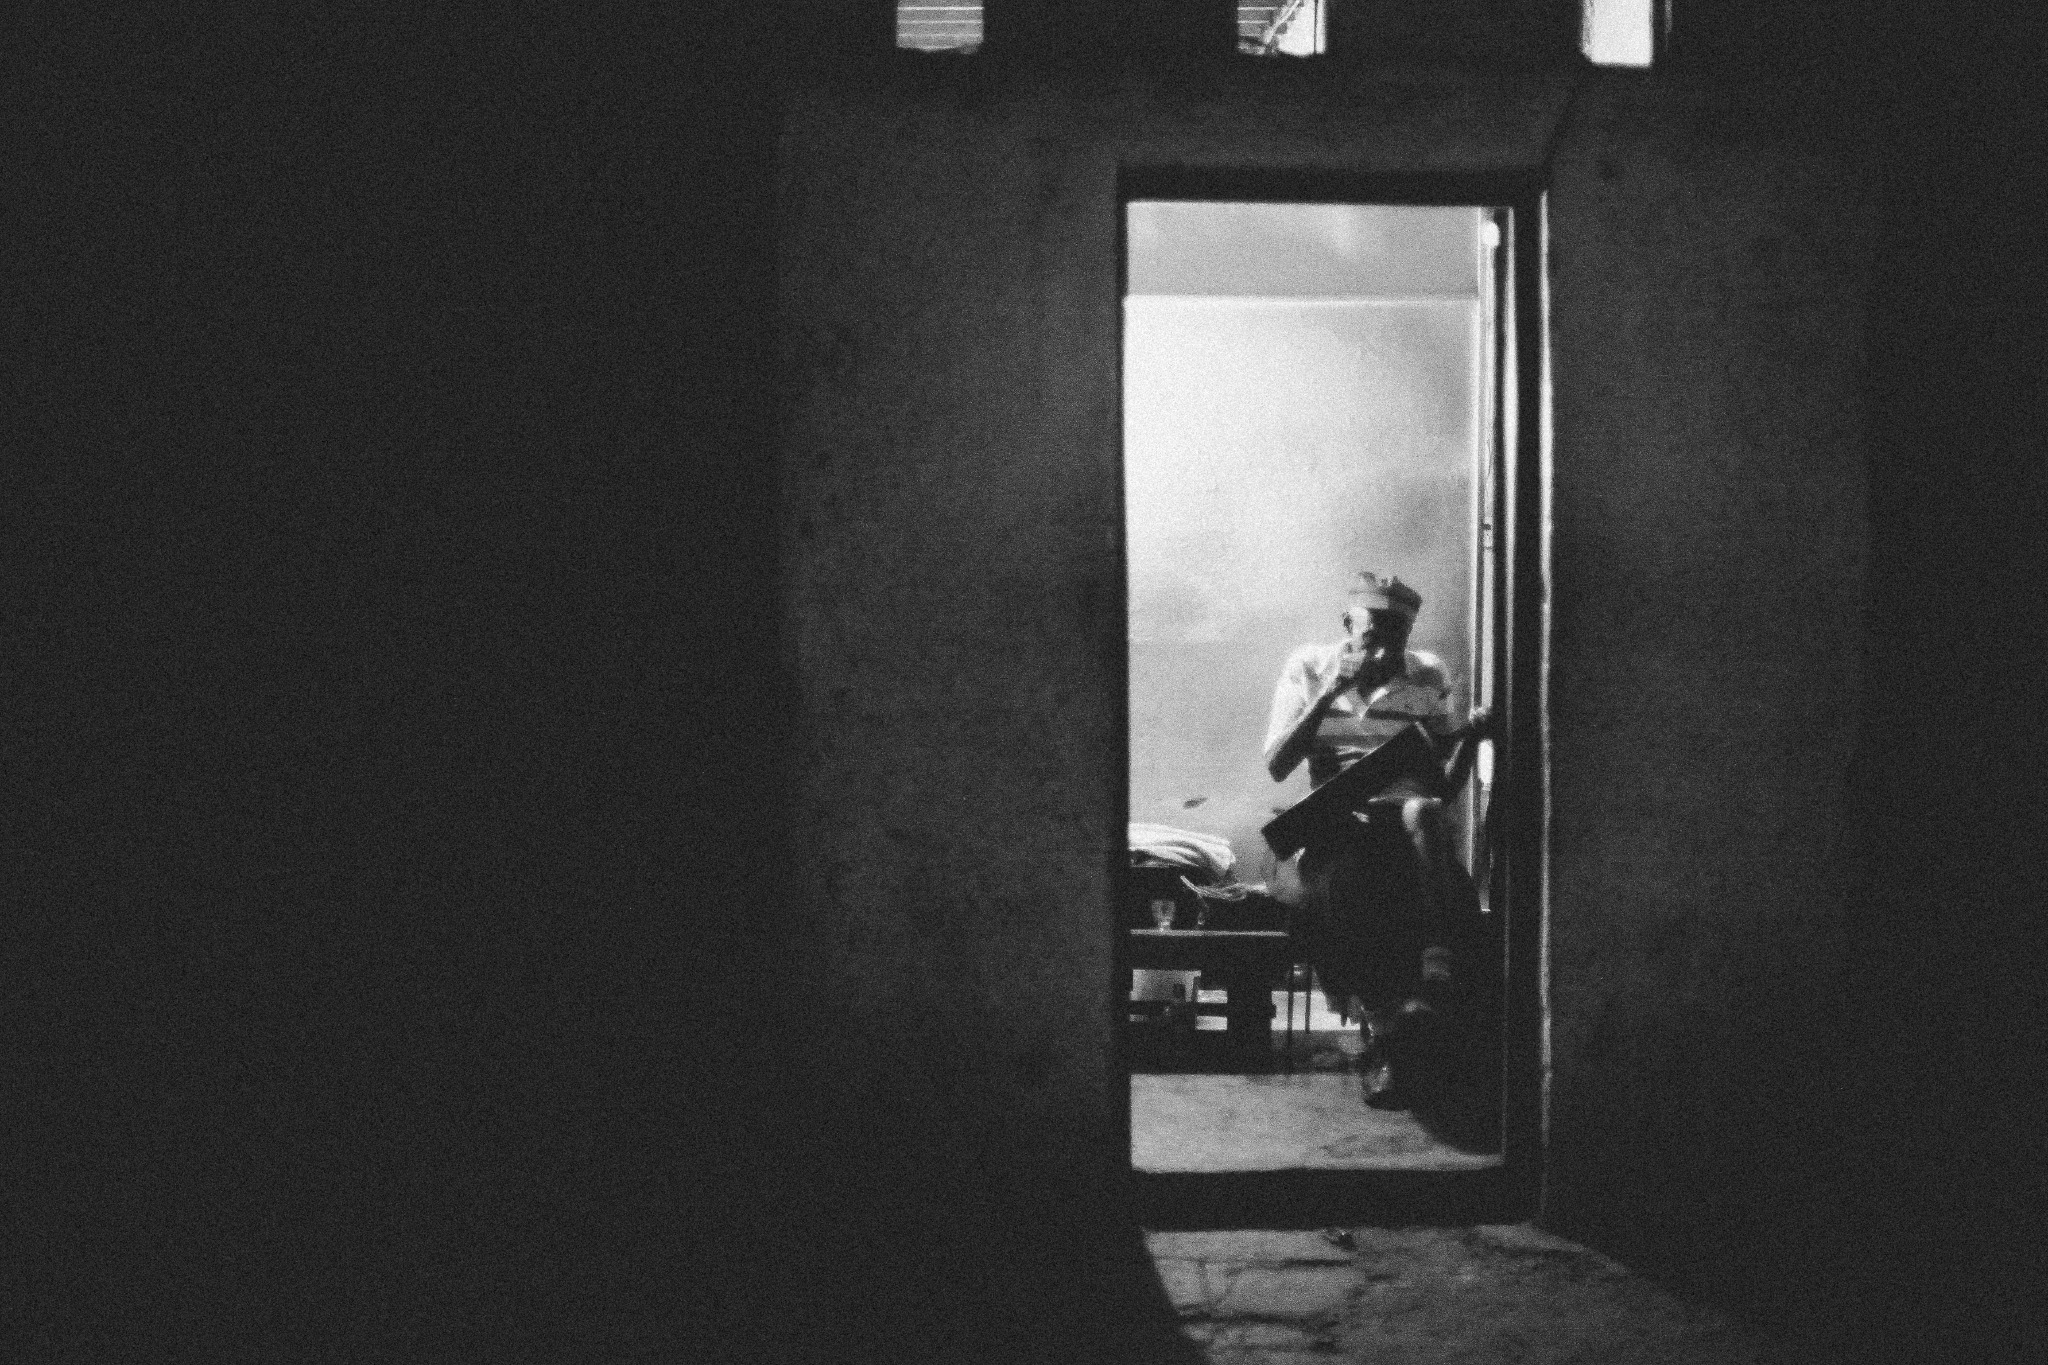 san diego wedding   photographer | old man with guitar seen through doorway